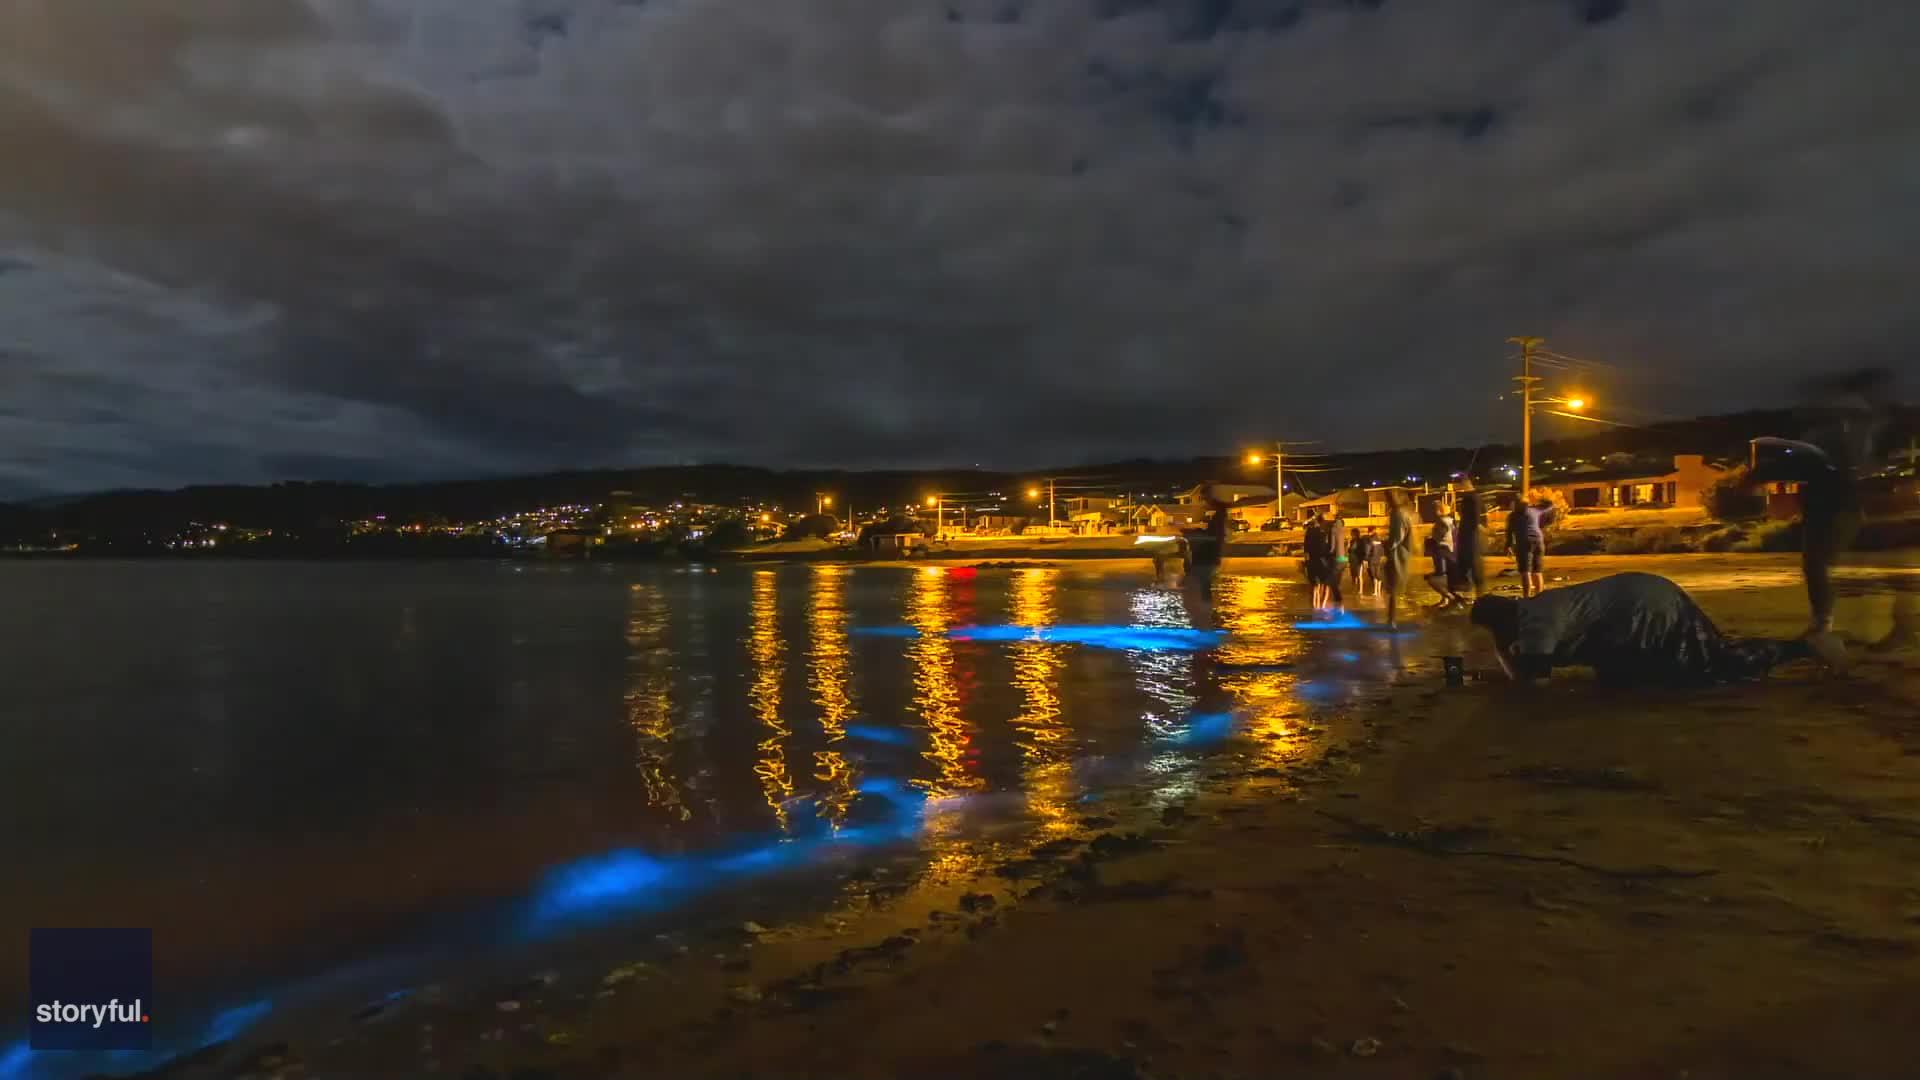 uk.news.yahoo.com: Bioluminescent Algae Light Up Along Tasmanian Beach